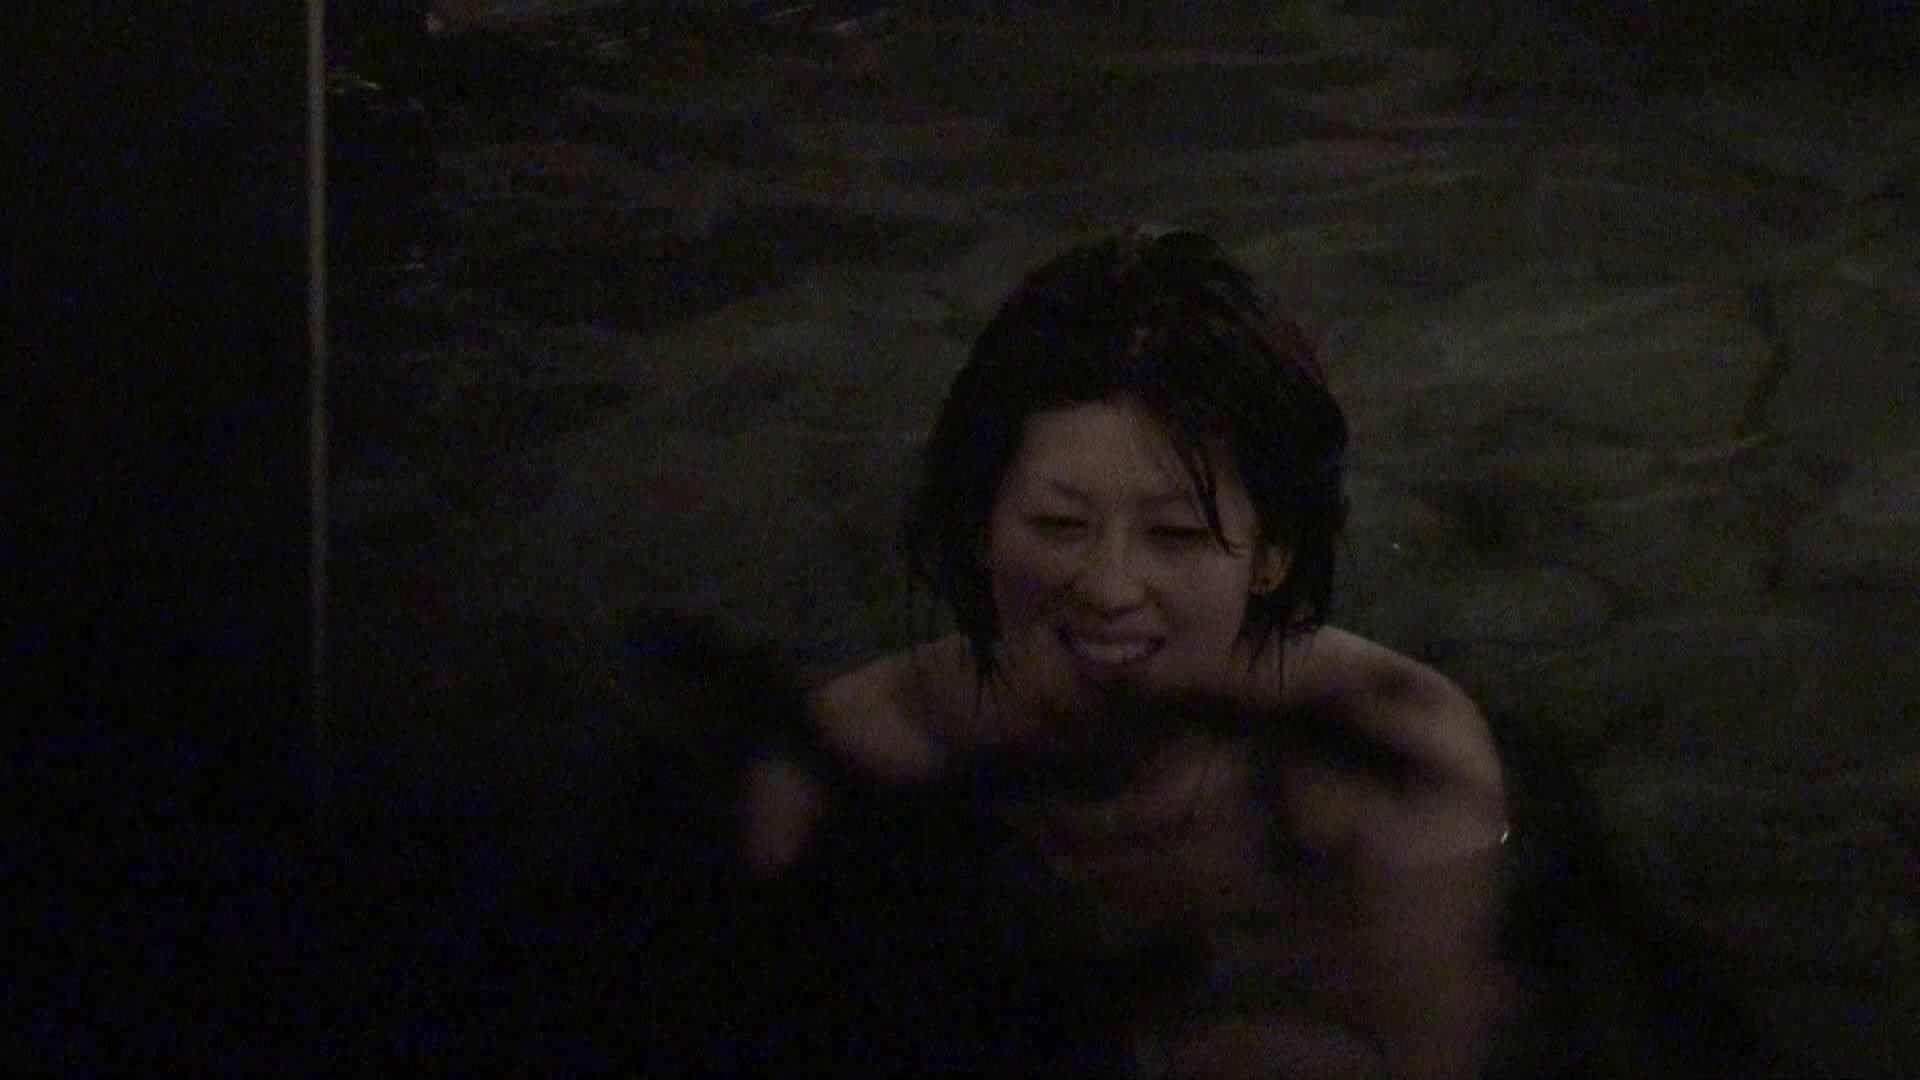 Aquaな露天風呂Vol.376 0  47連発 12